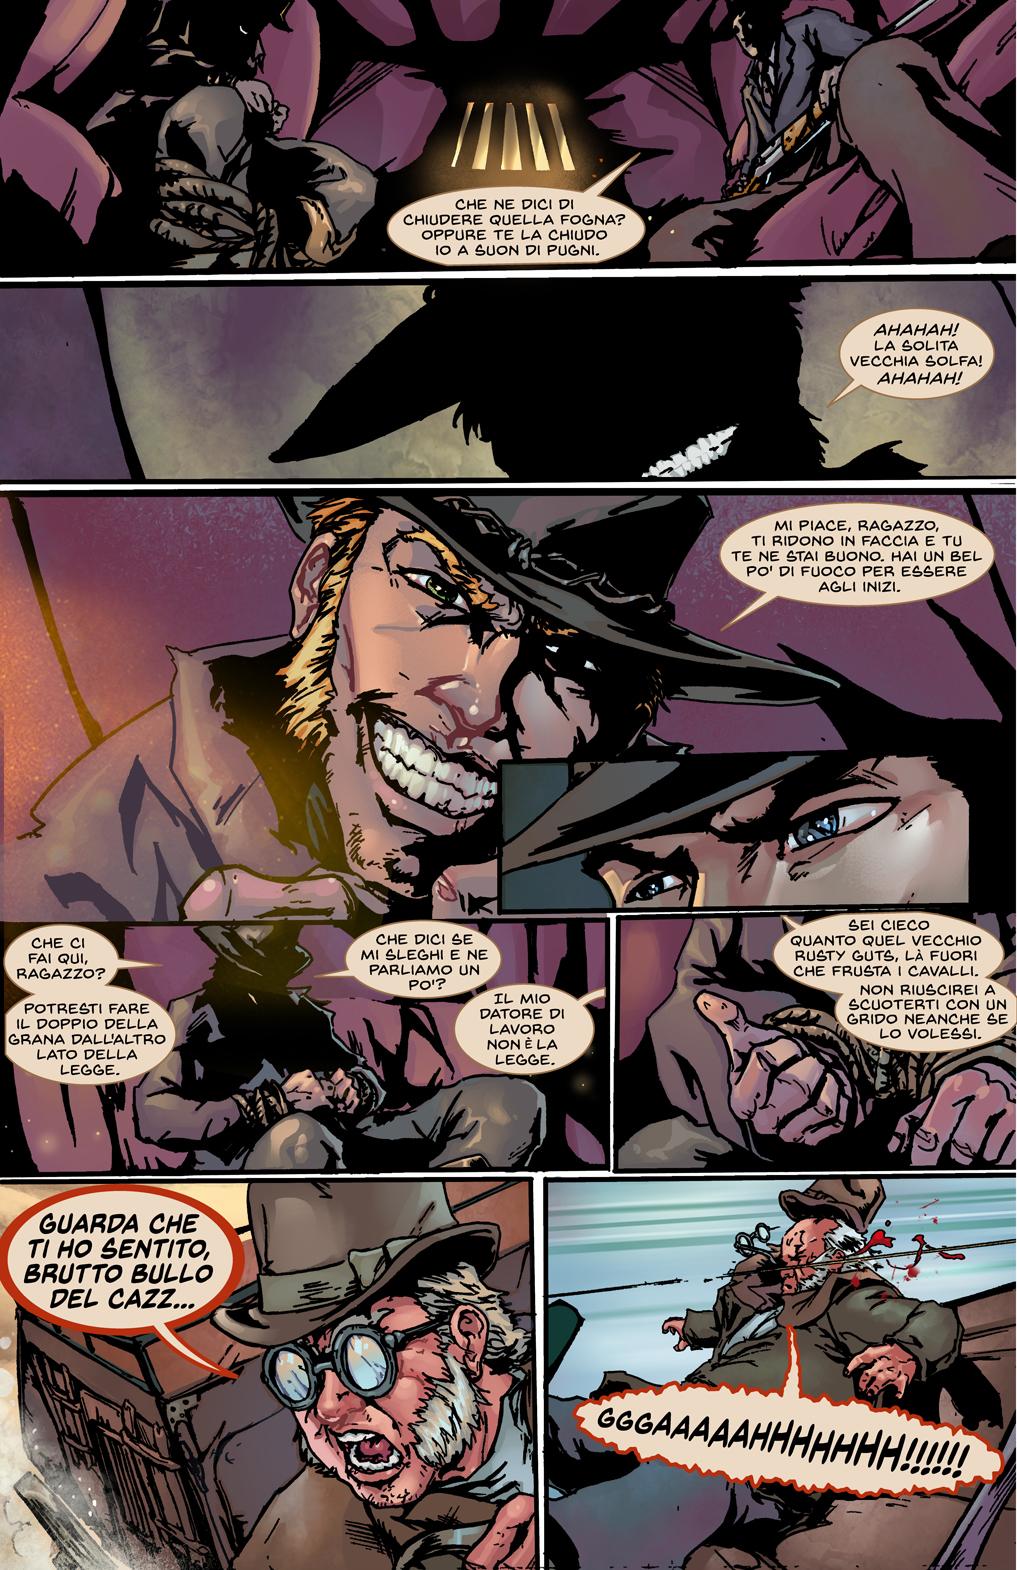 Sartana #1 - Page 2 - Italian Edition